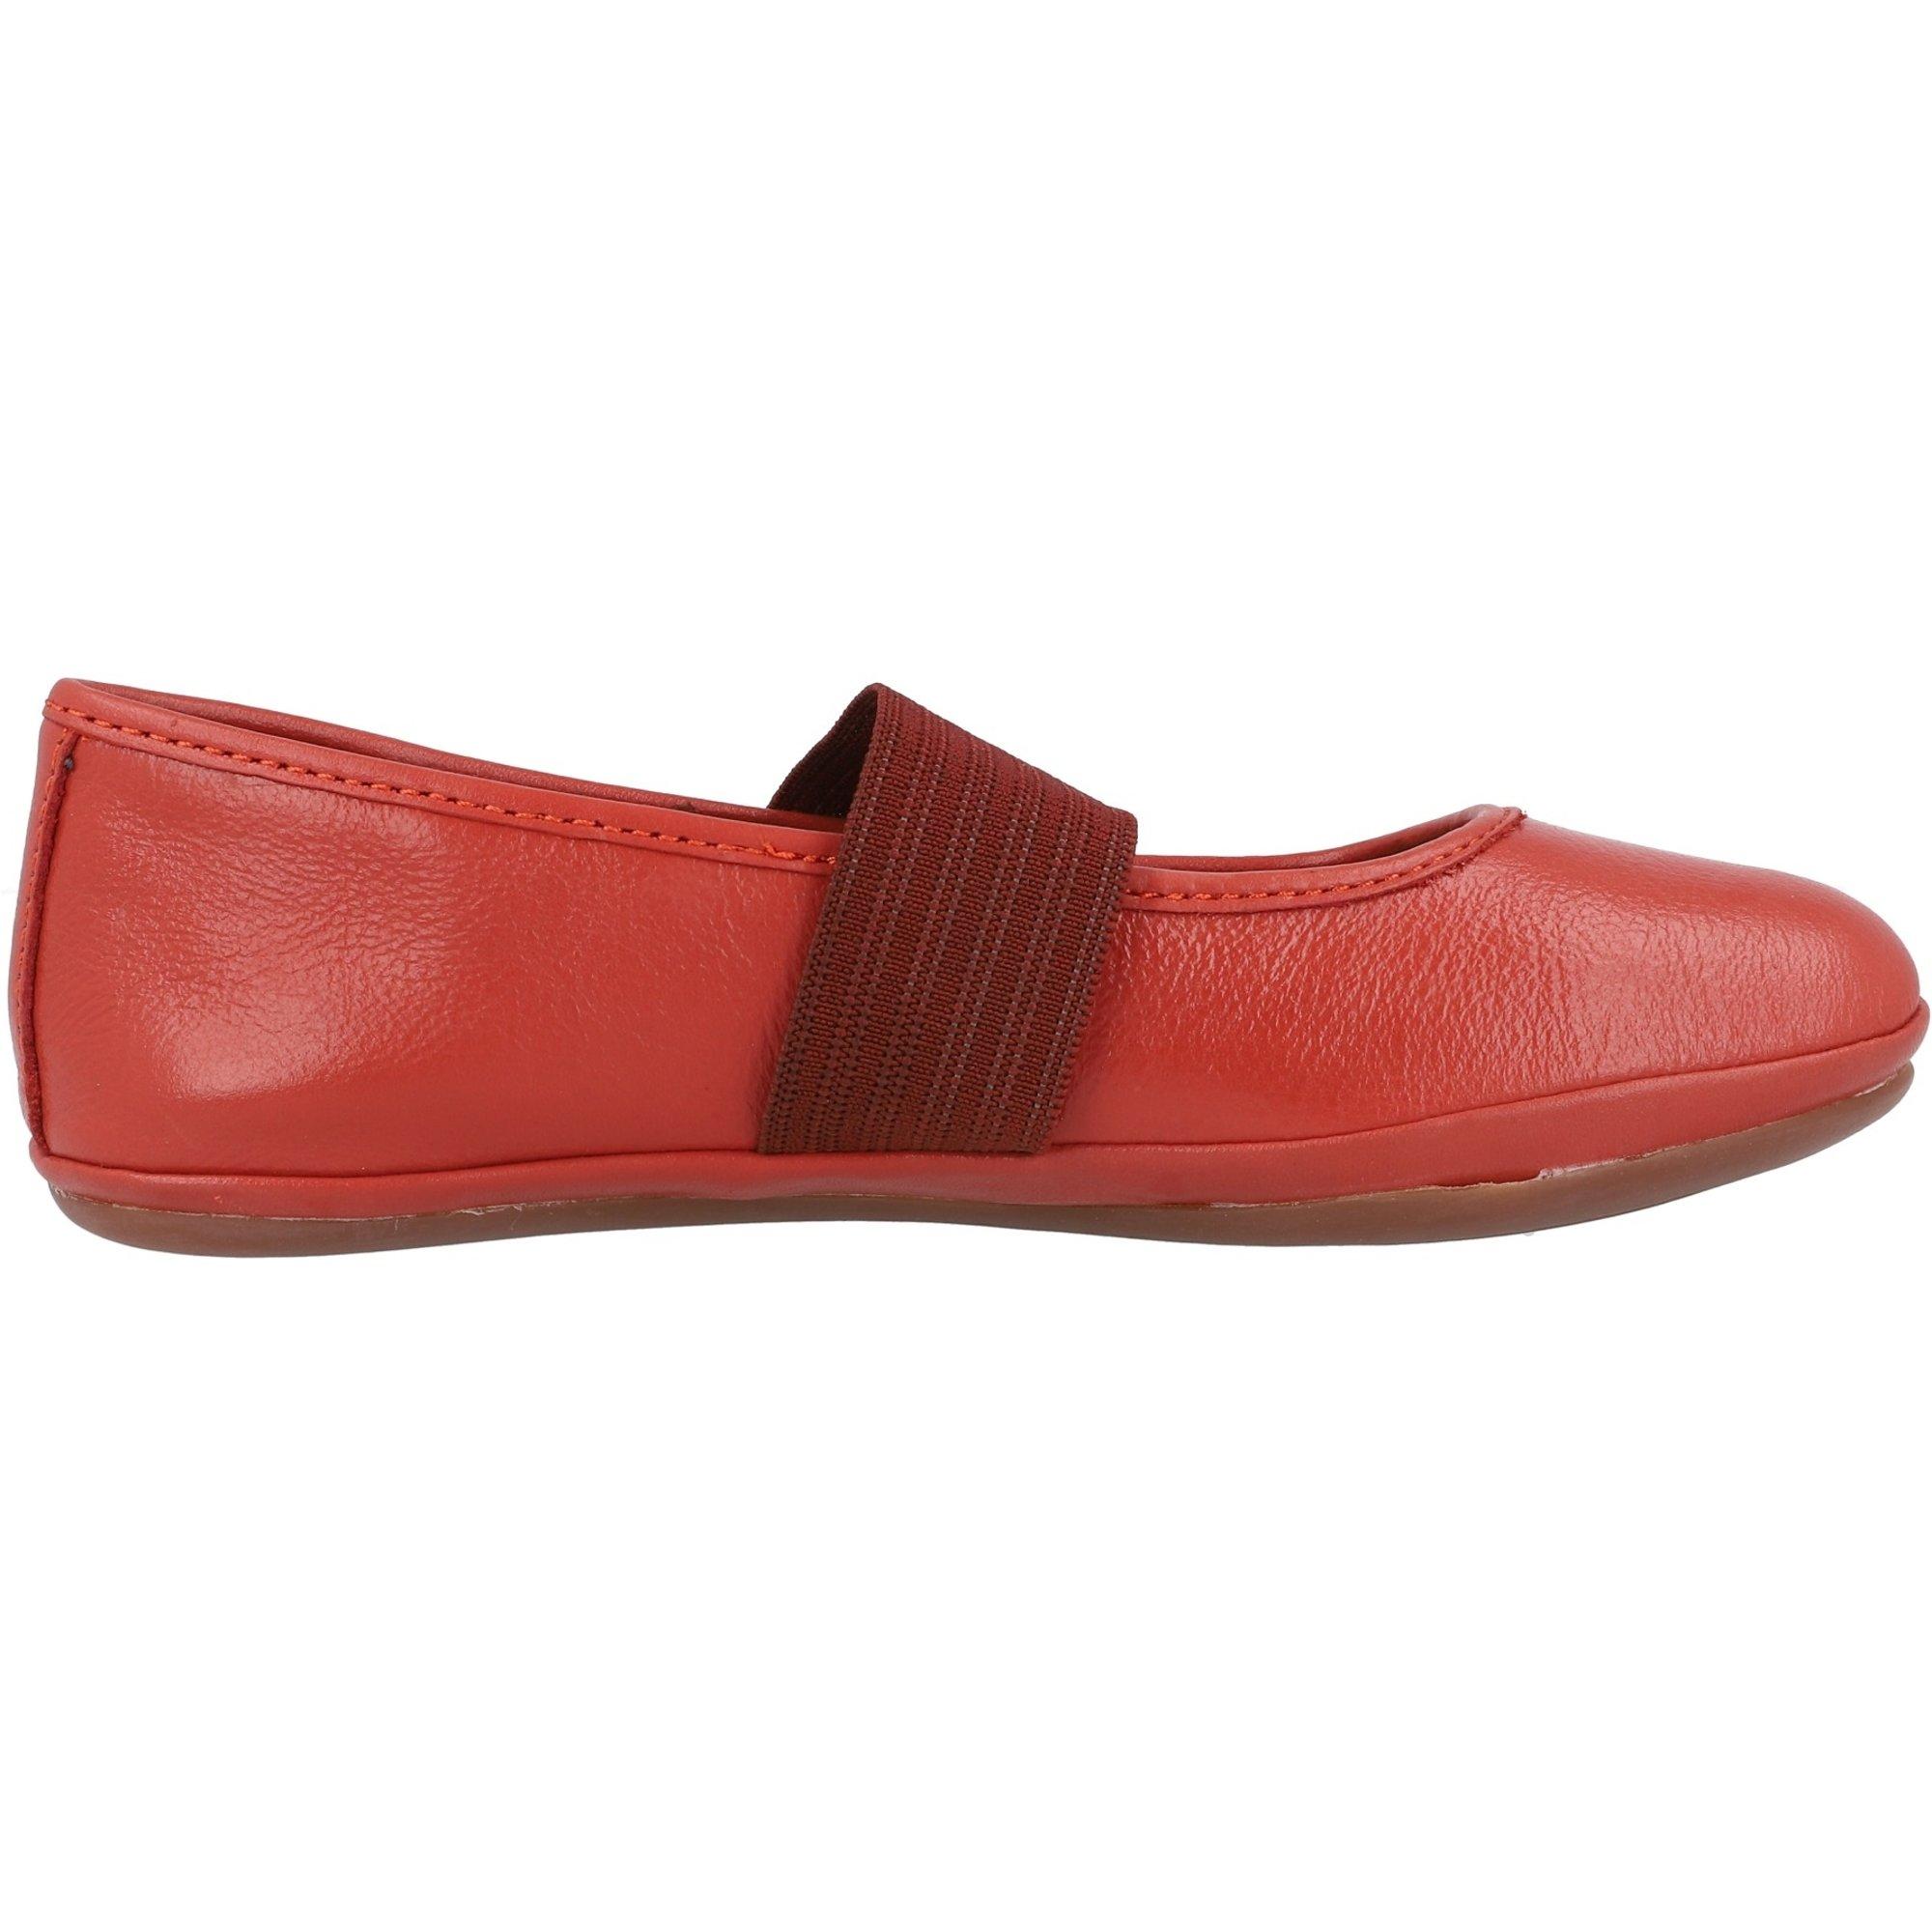 Camper Kids Right Medium Red Leather